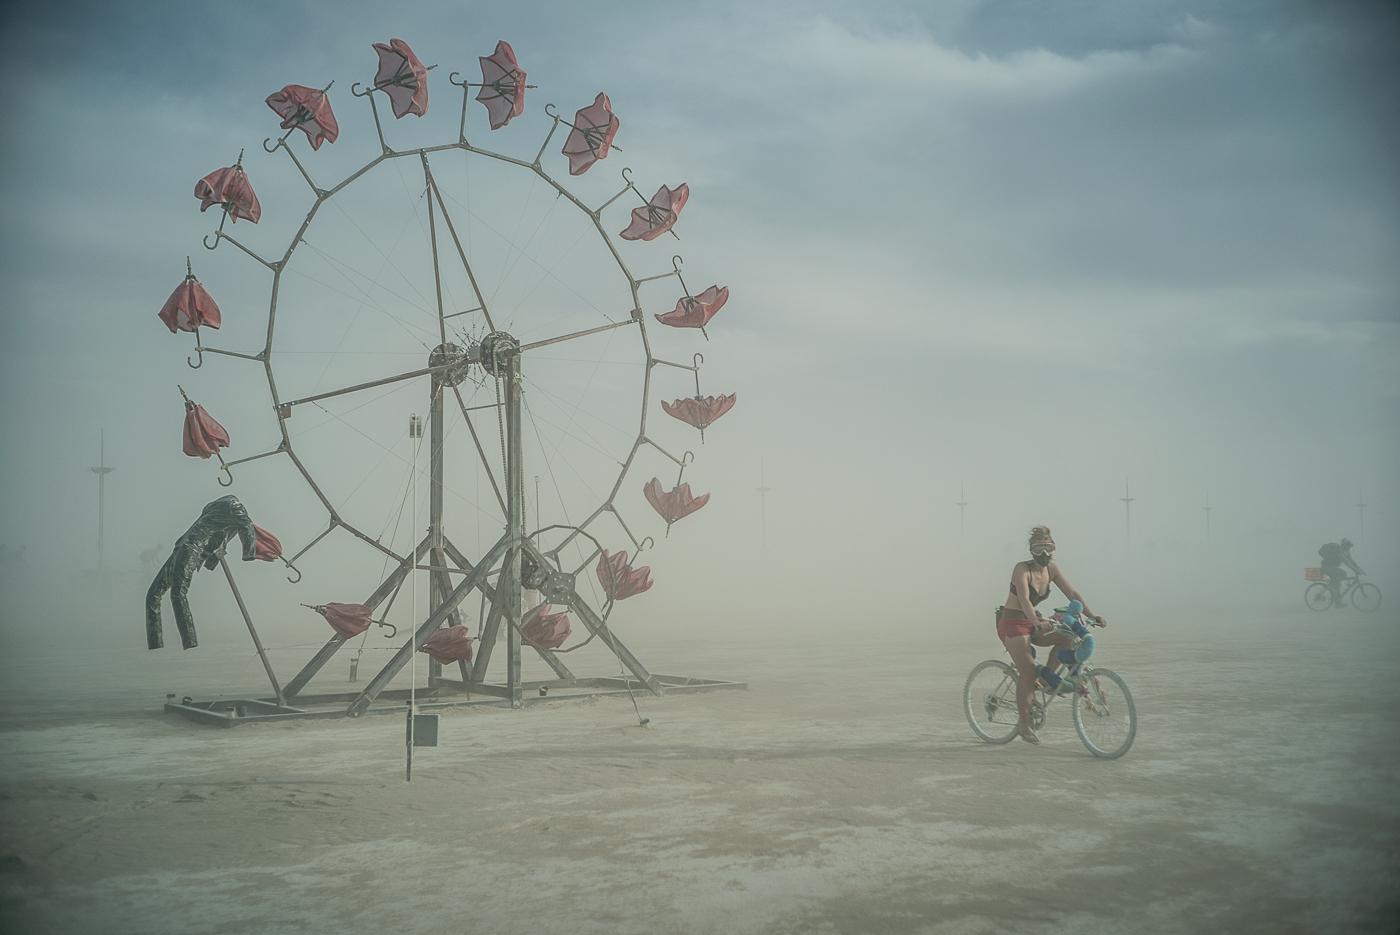 Umbrella Wheel, Burning Man 2014: In Dust We Trust - Photos of a Dusty Playa